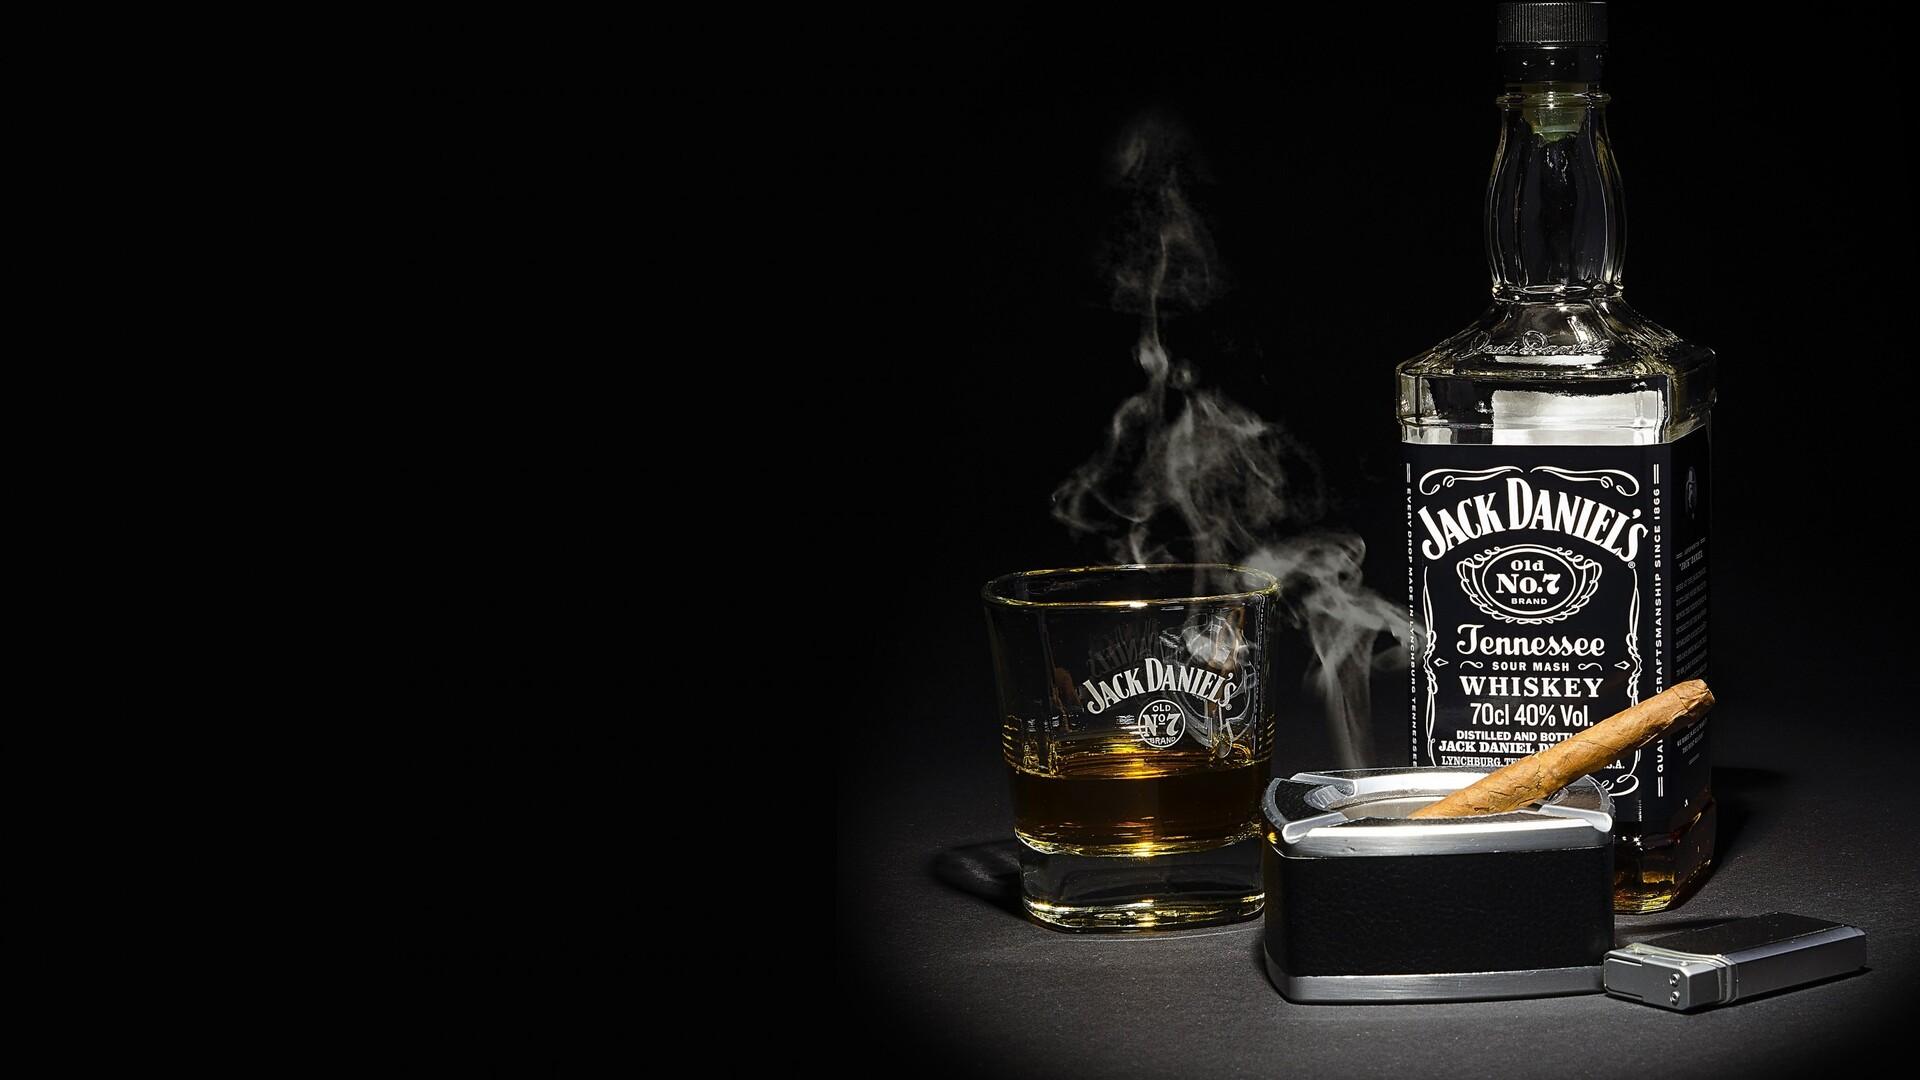 1920x1080 jack daniels whiskey laptop full hd 1080p hd 4k wallpapers jack daniels whiskey 4kg voltagebd Images